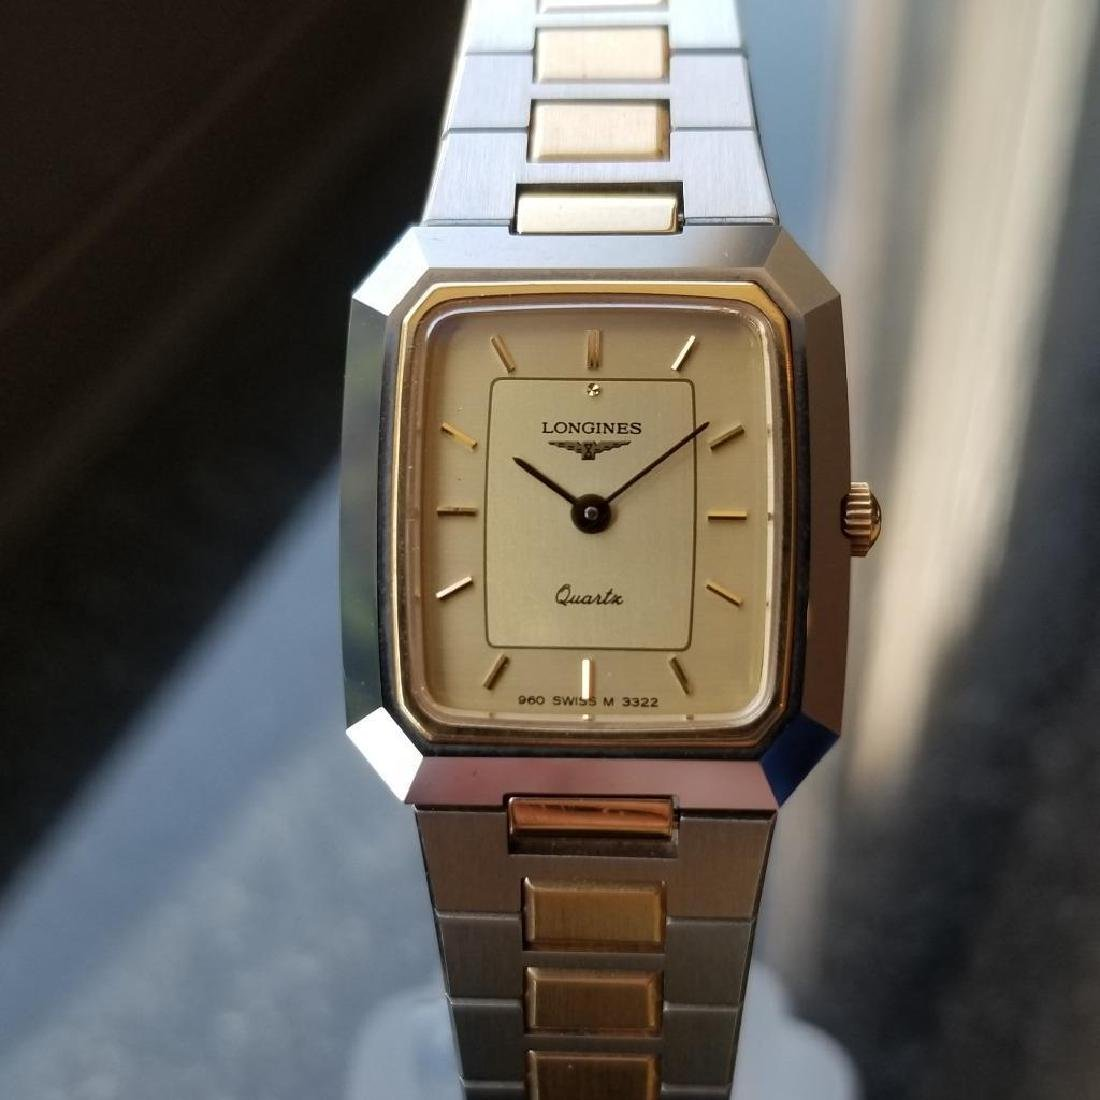 Longines Ladies 1980s Gold Plated Stainless Quartz - 4